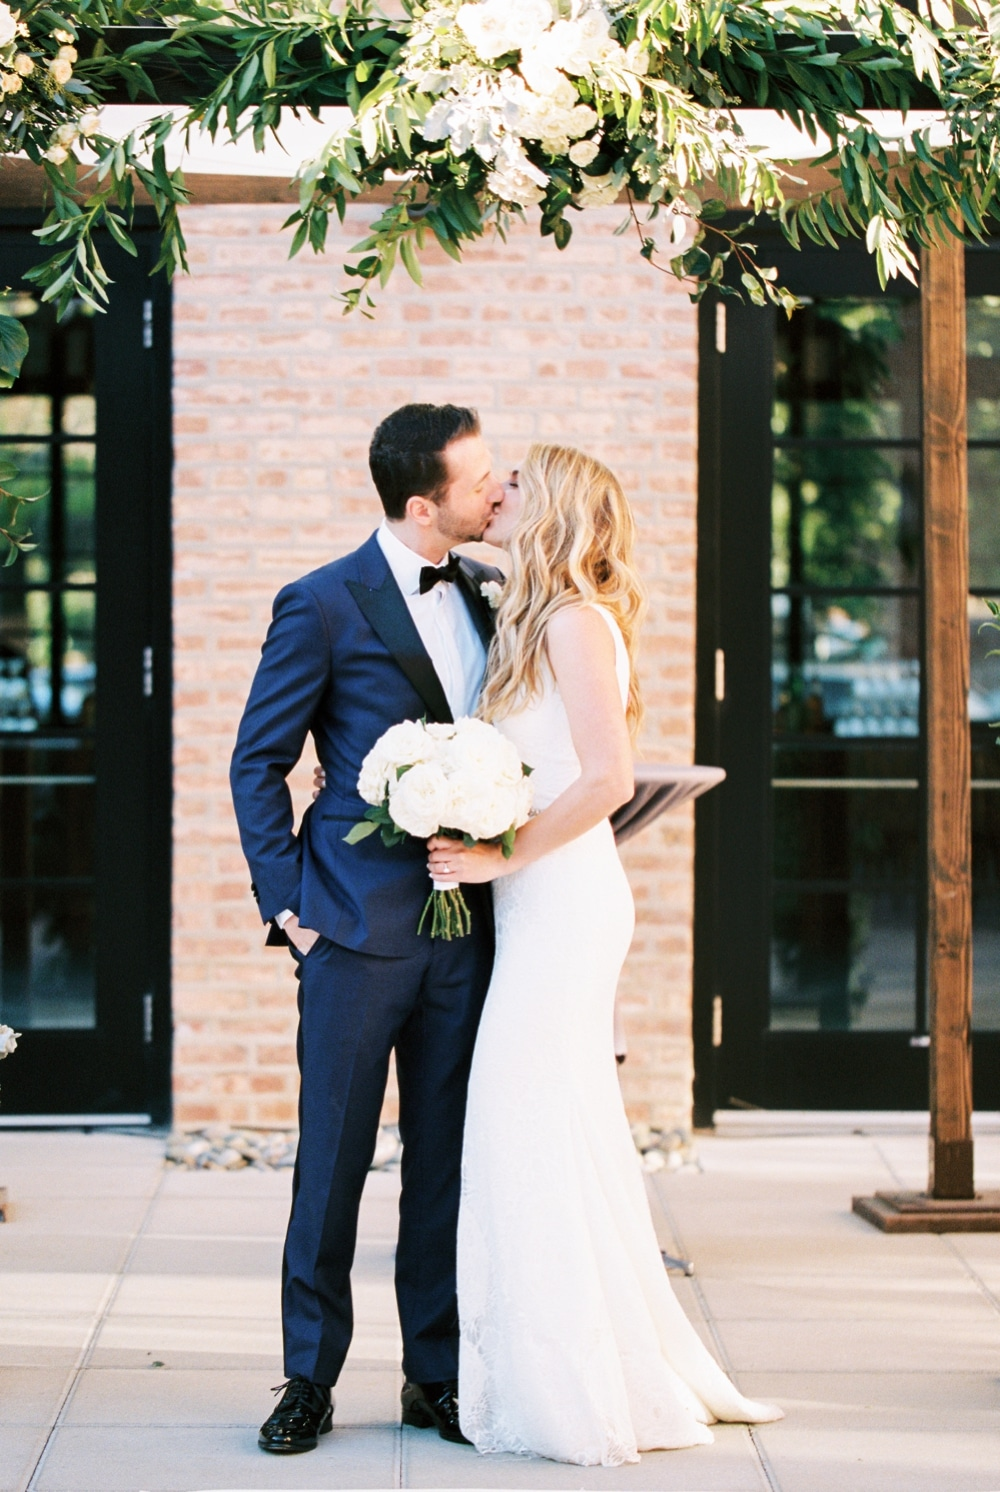 kristin-la-voie-photography-revel-motor-row-chicago-wedding-photographer-123